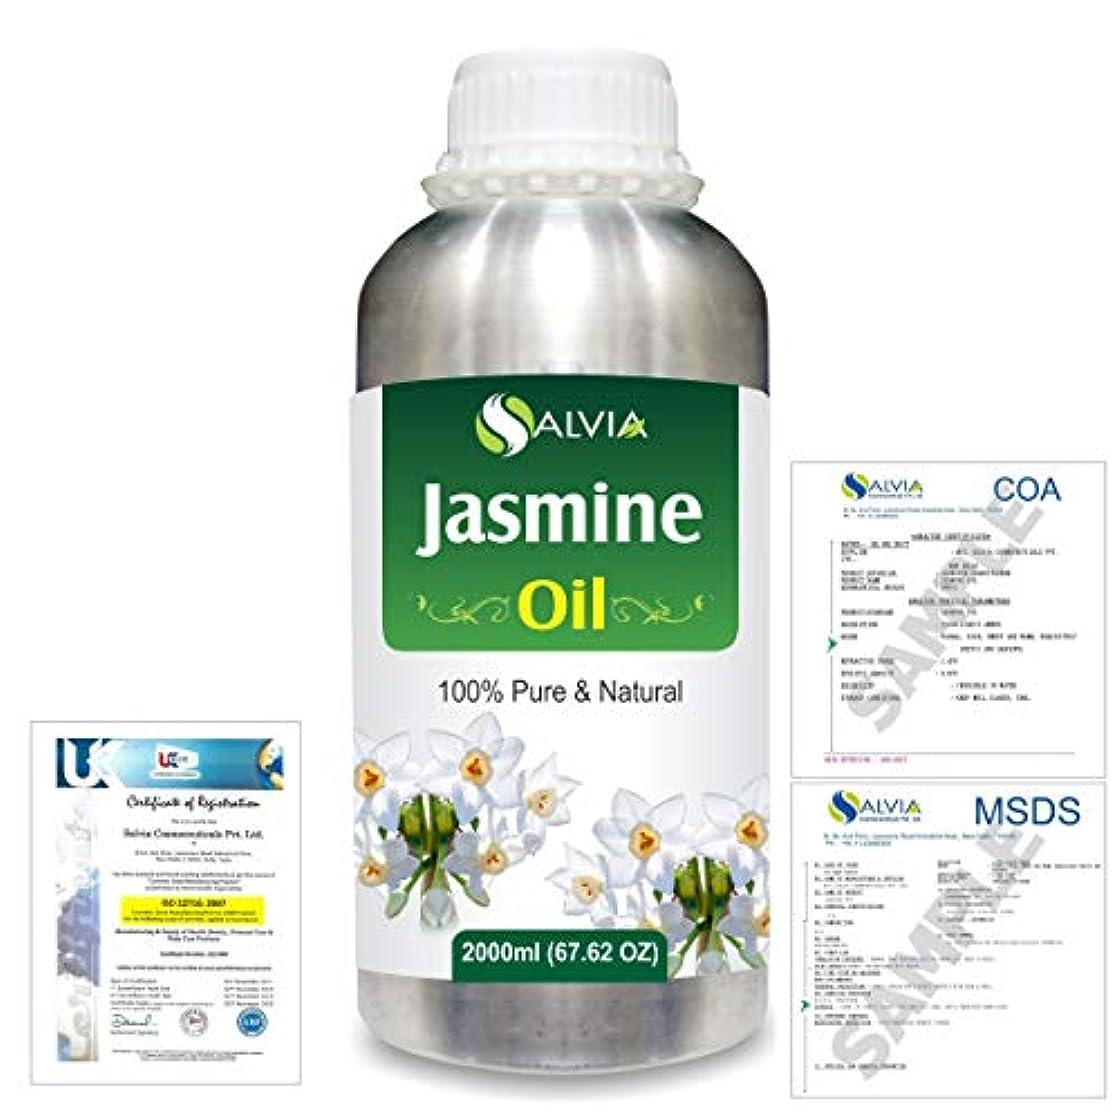 良心添加剤実質的Jasmine (Jasminum Grandiflorum) 100% Natural Pure Essential Oil 2000ml/67 fl.oz.